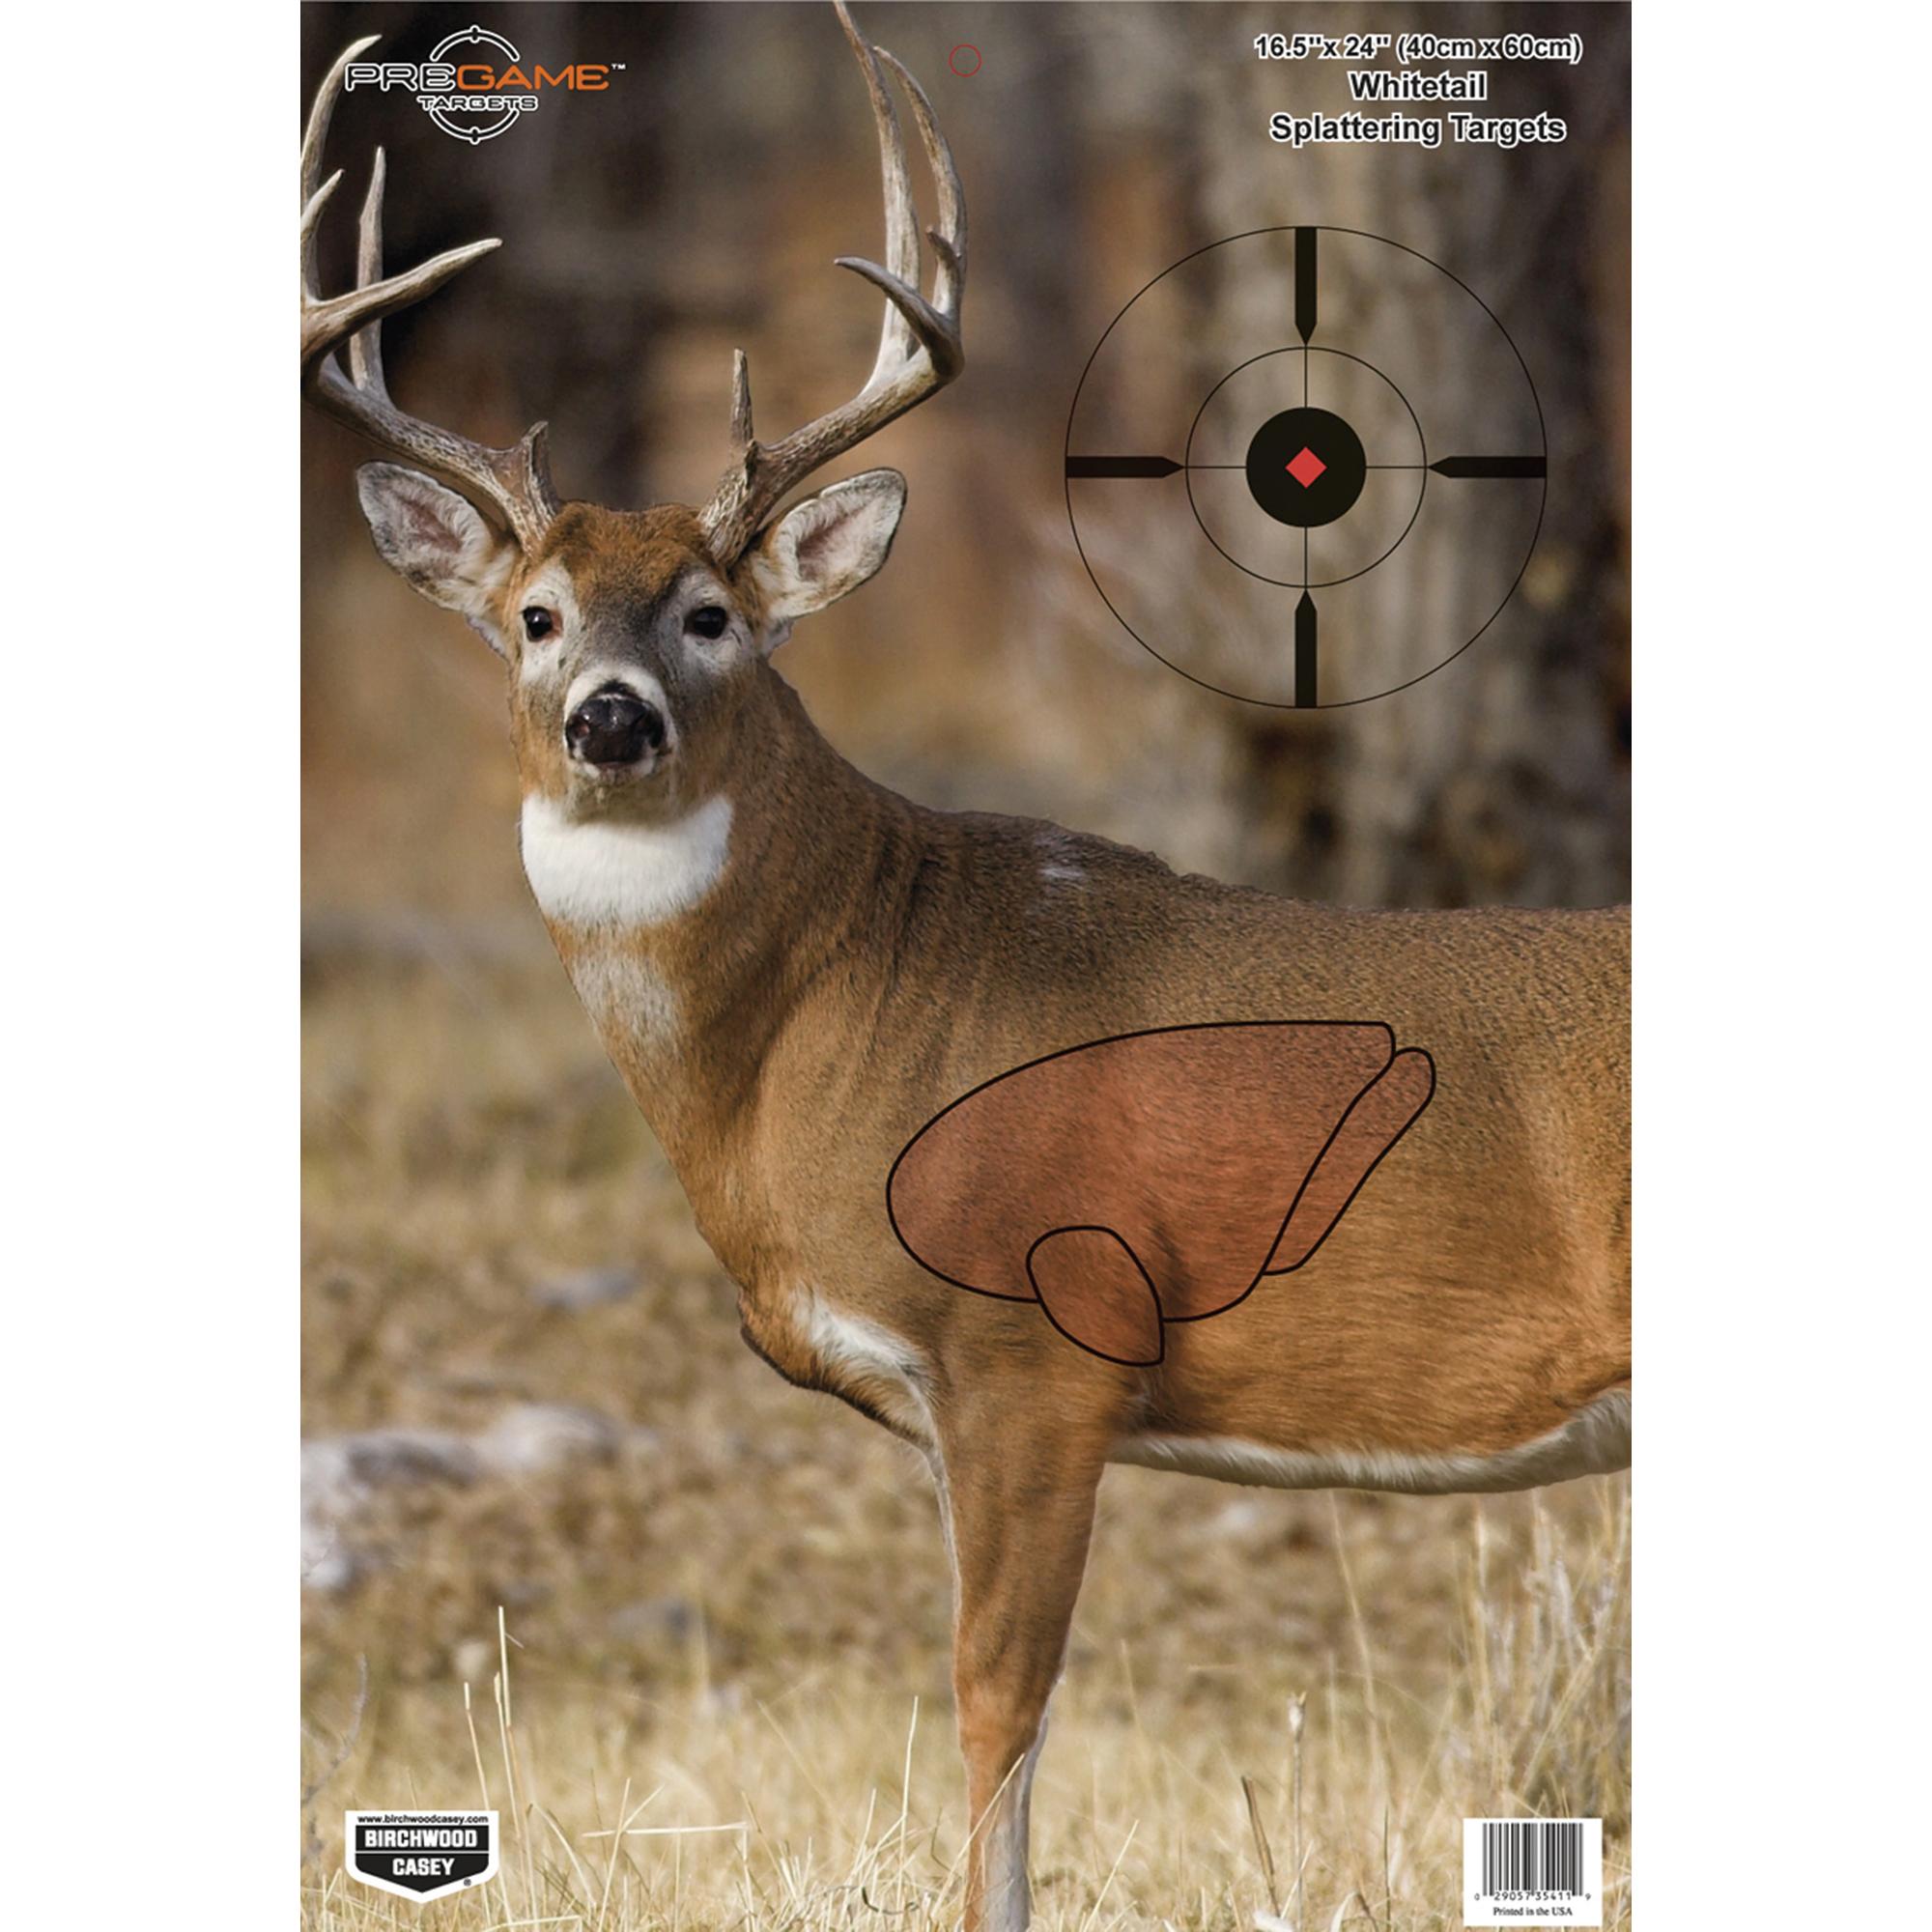 B/c Pregame Deer Tgt 3-16.5x24